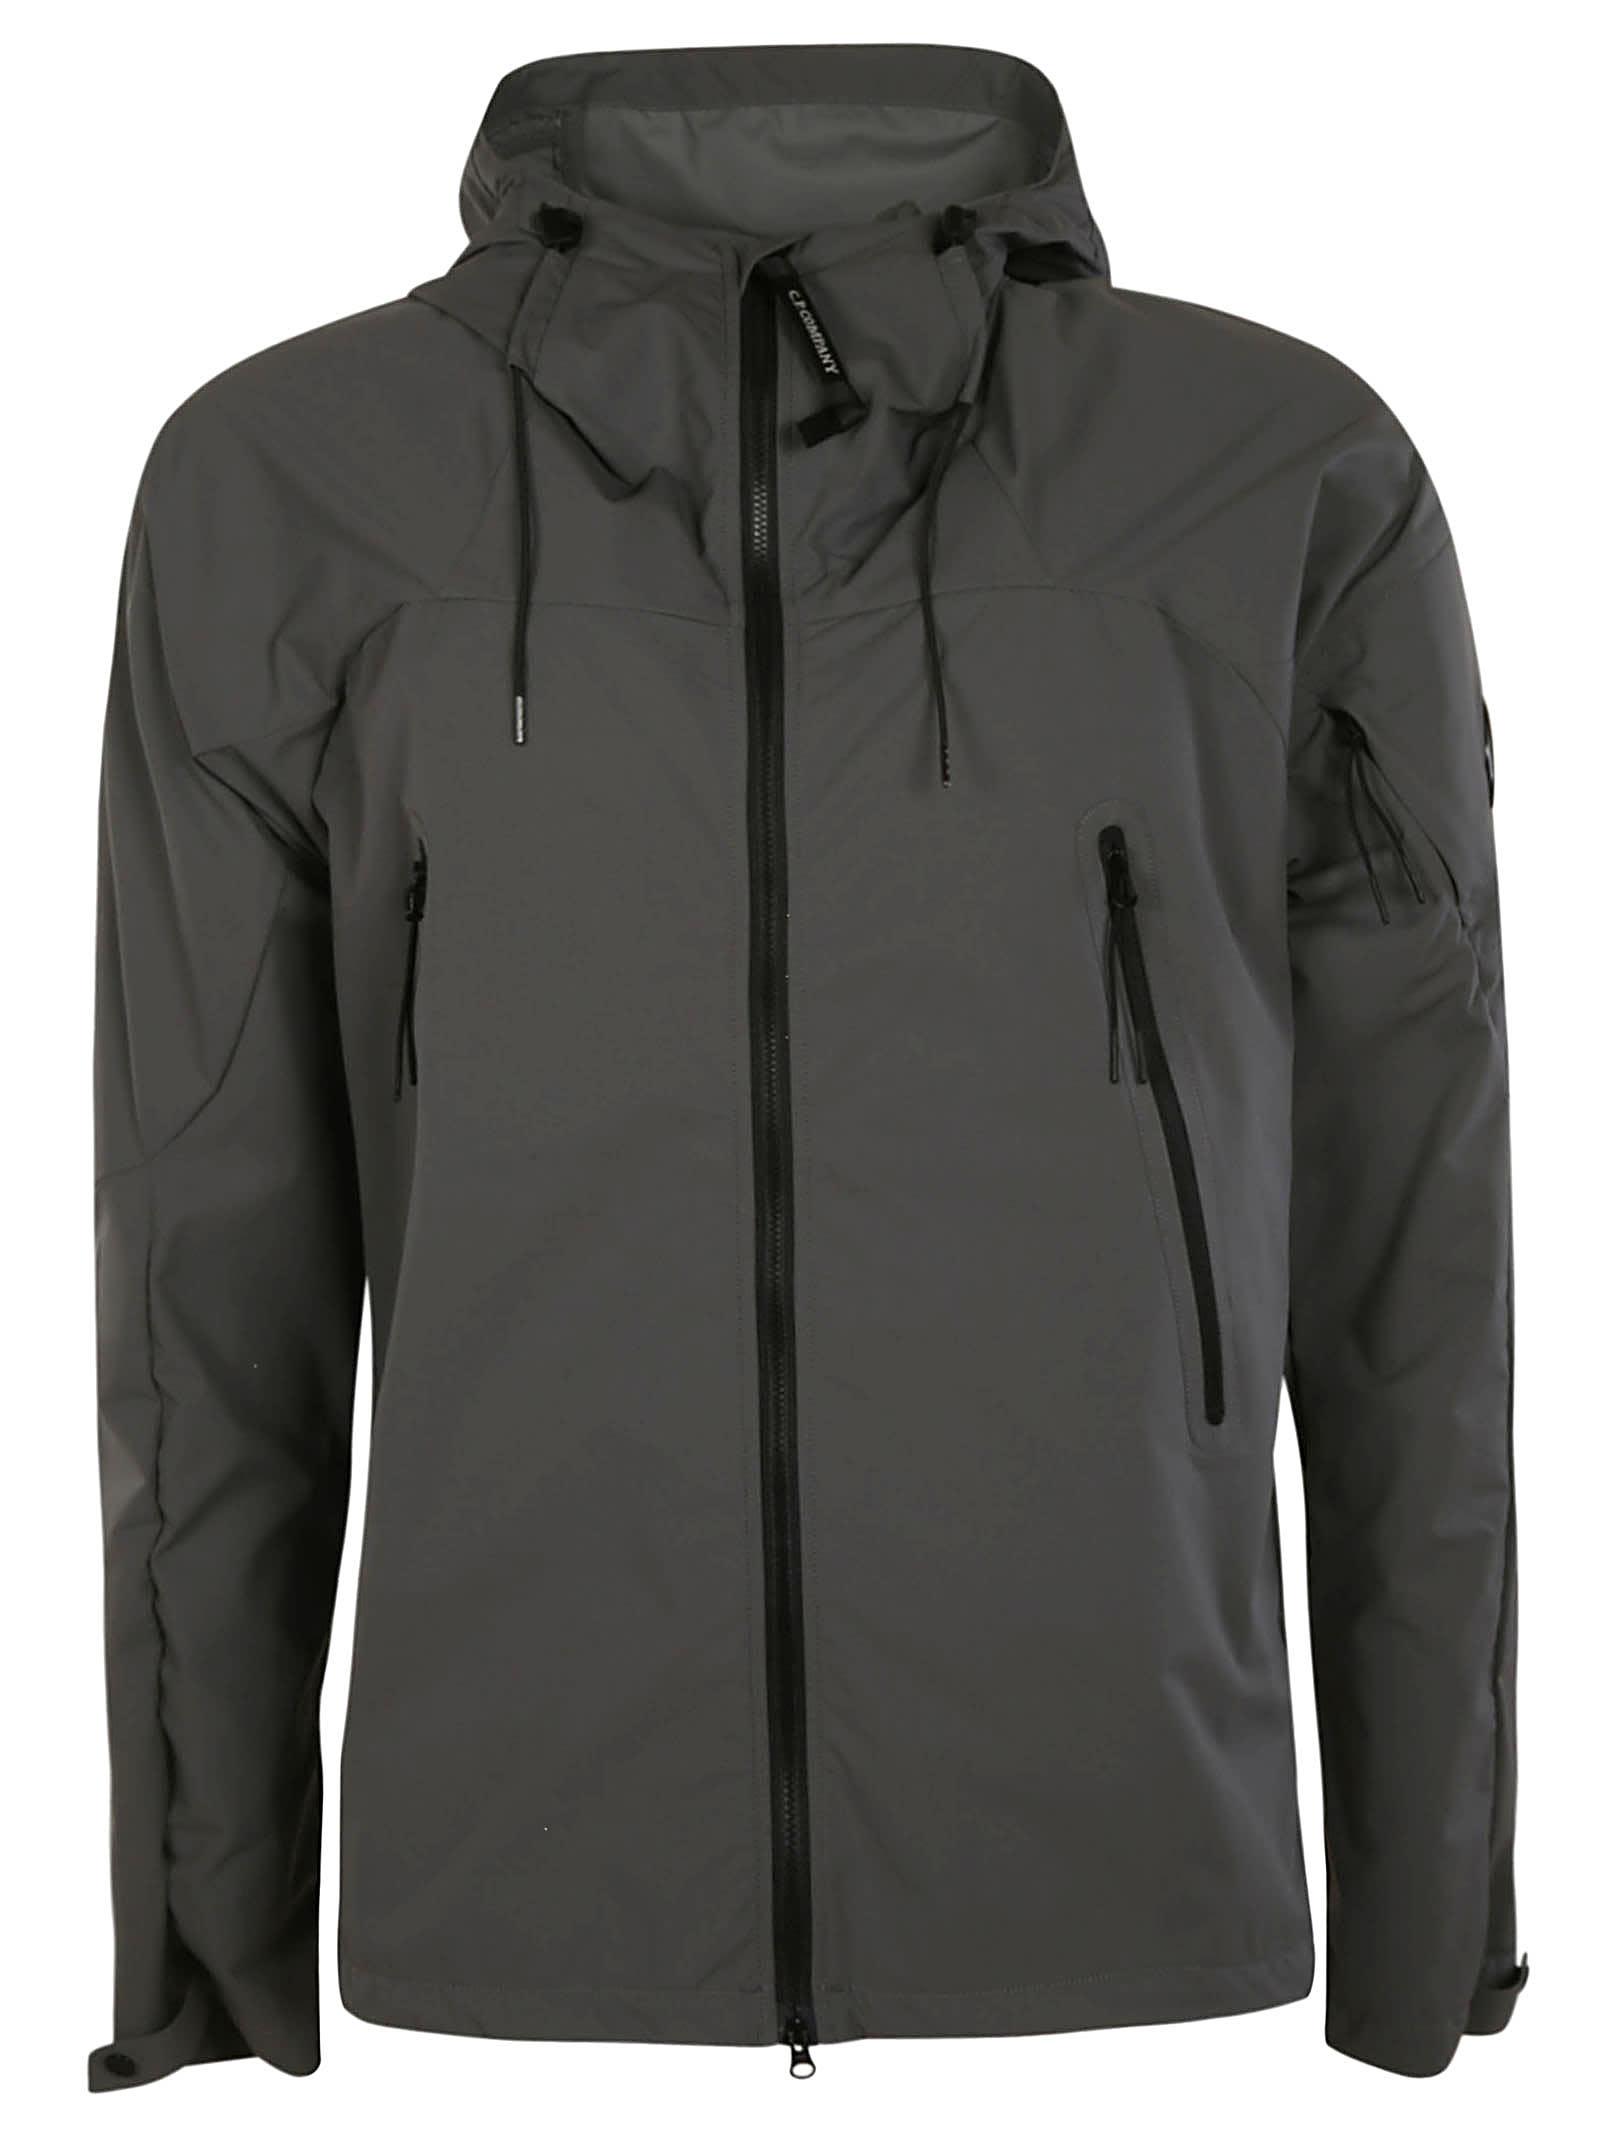 C.P. Company Pro-tek Jacket